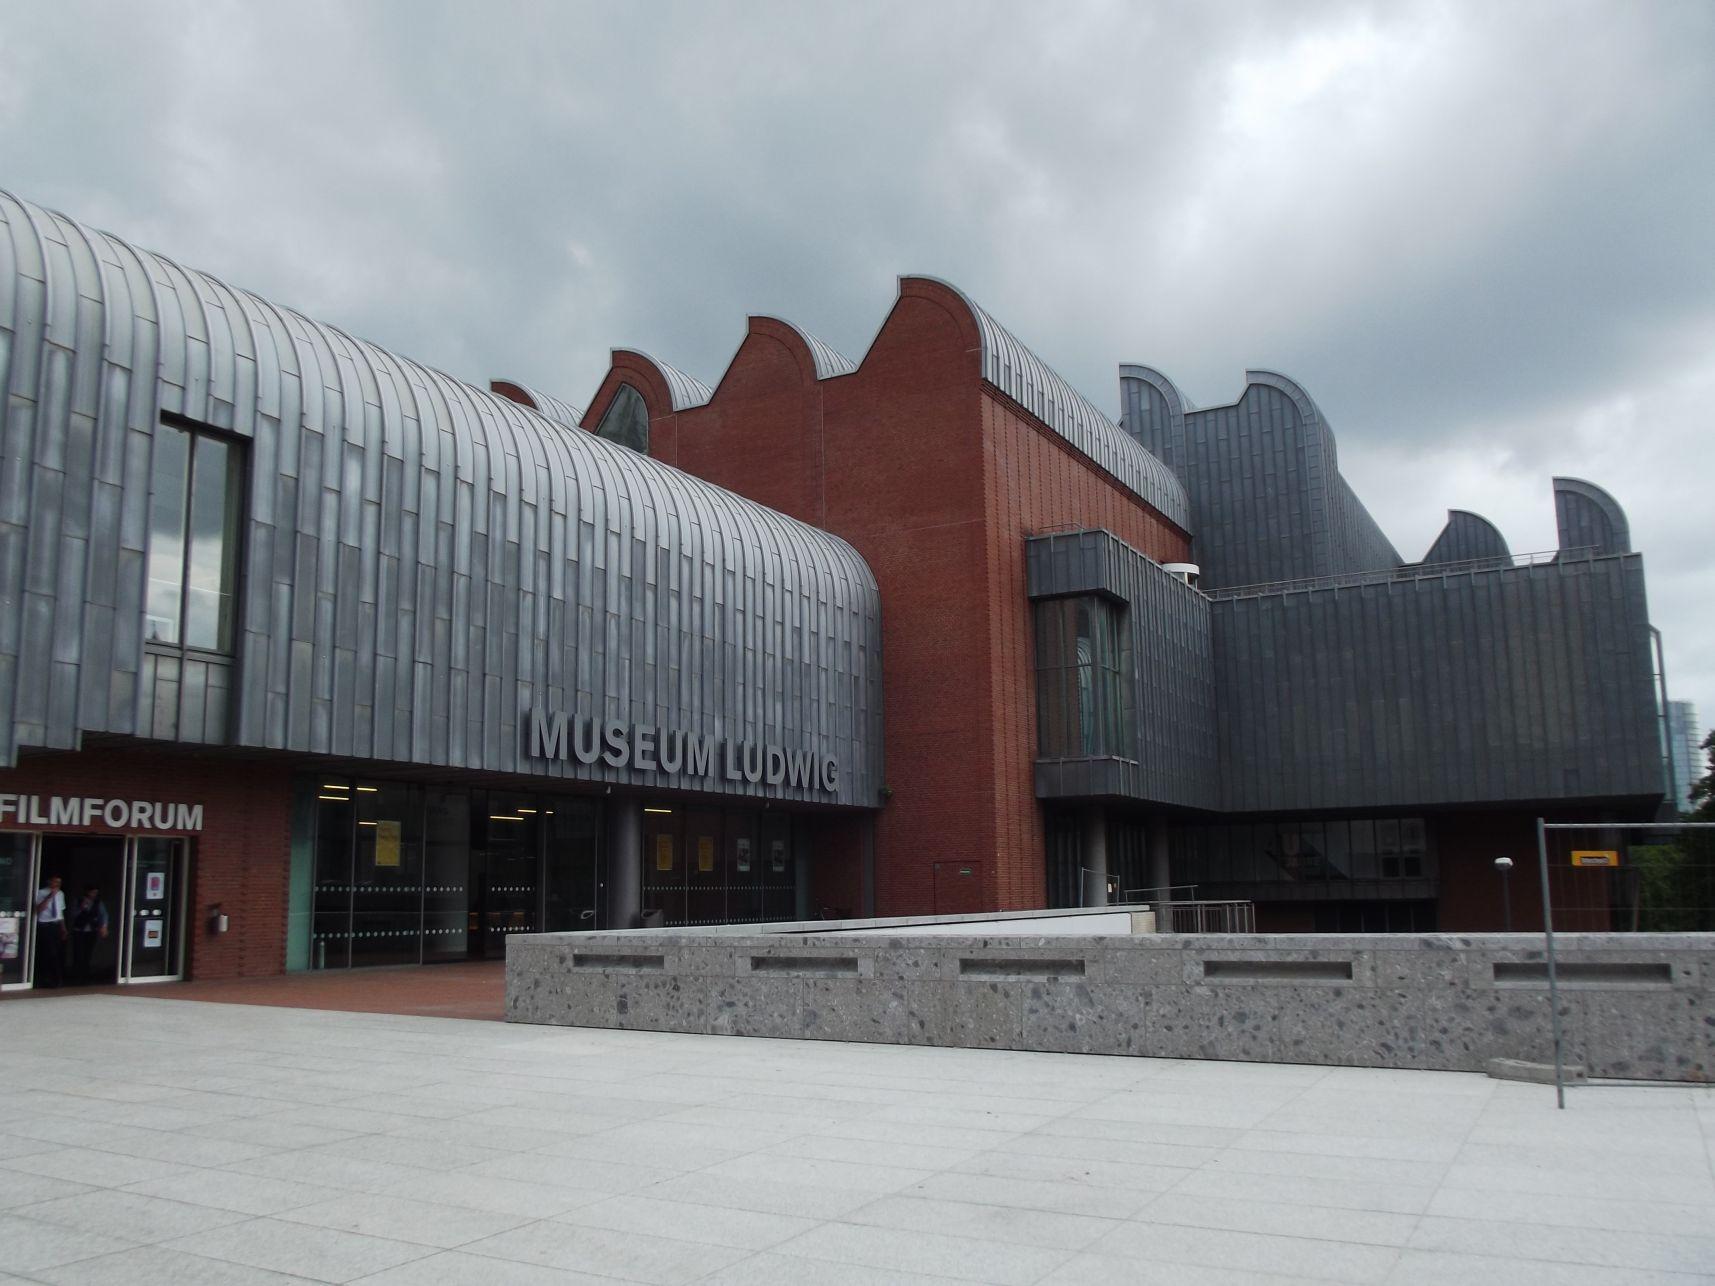 A Ludwig Múzeum